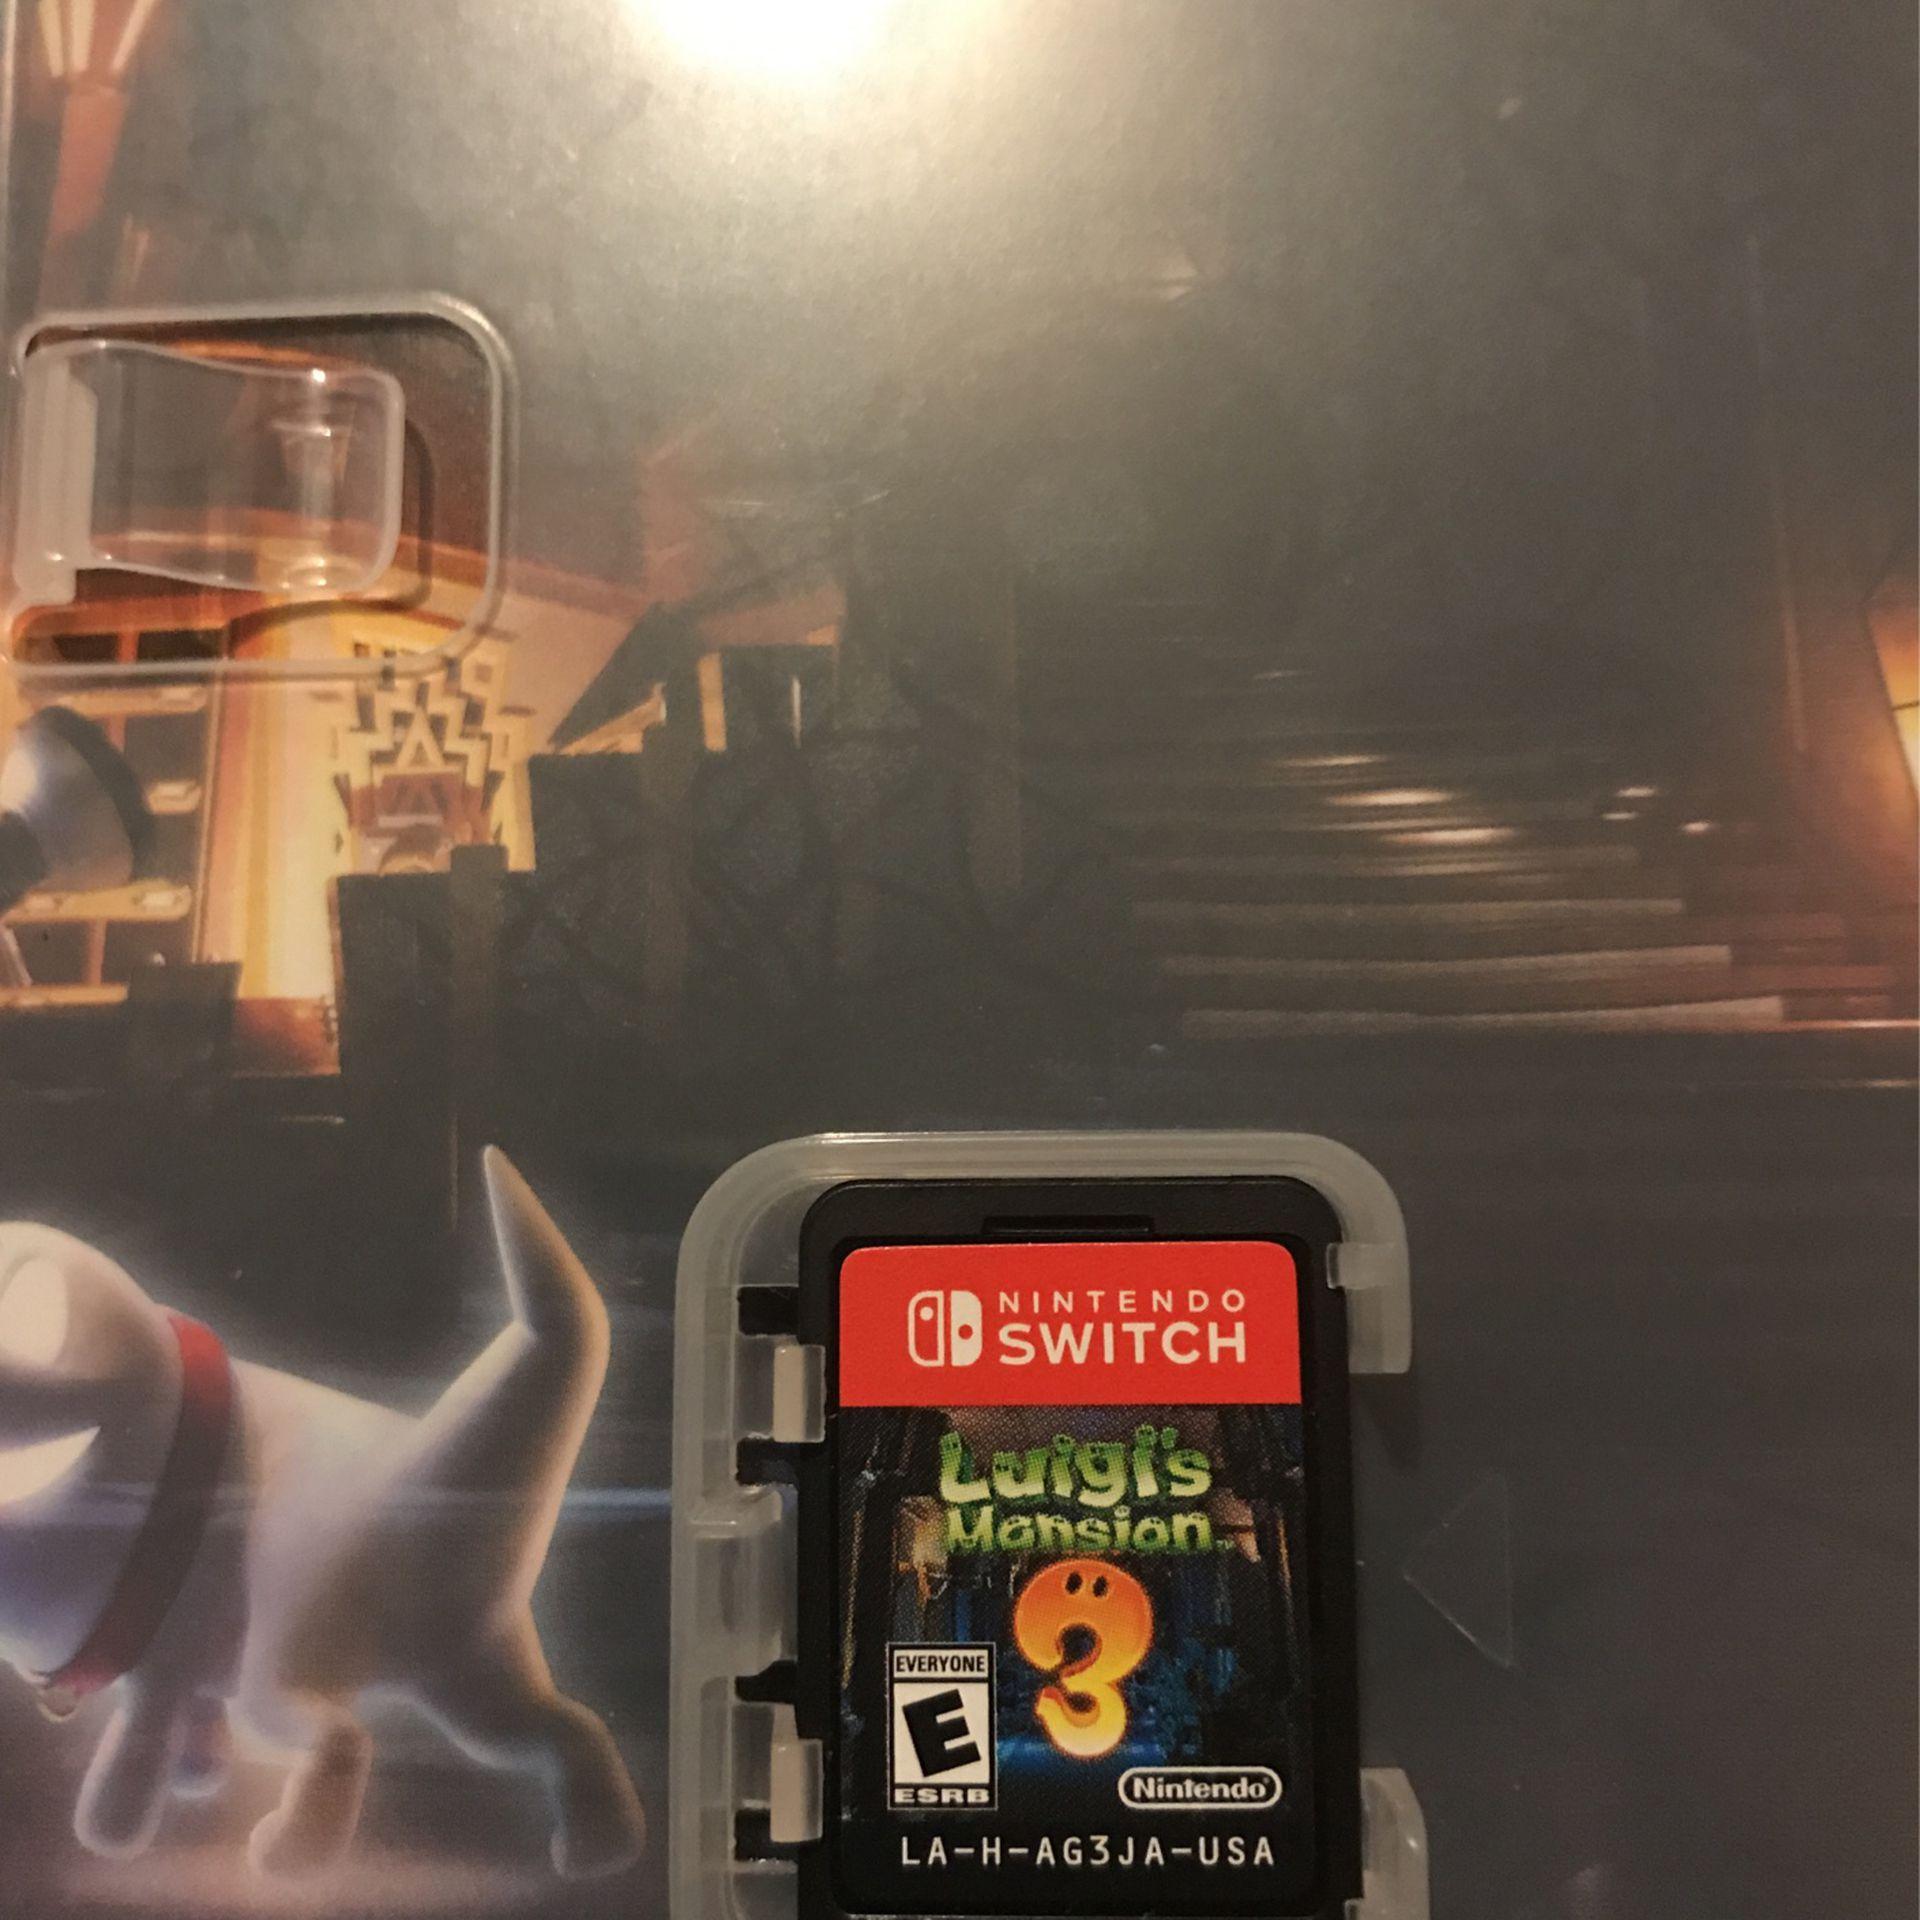 Nintendo Switch Luigis Mansion 3